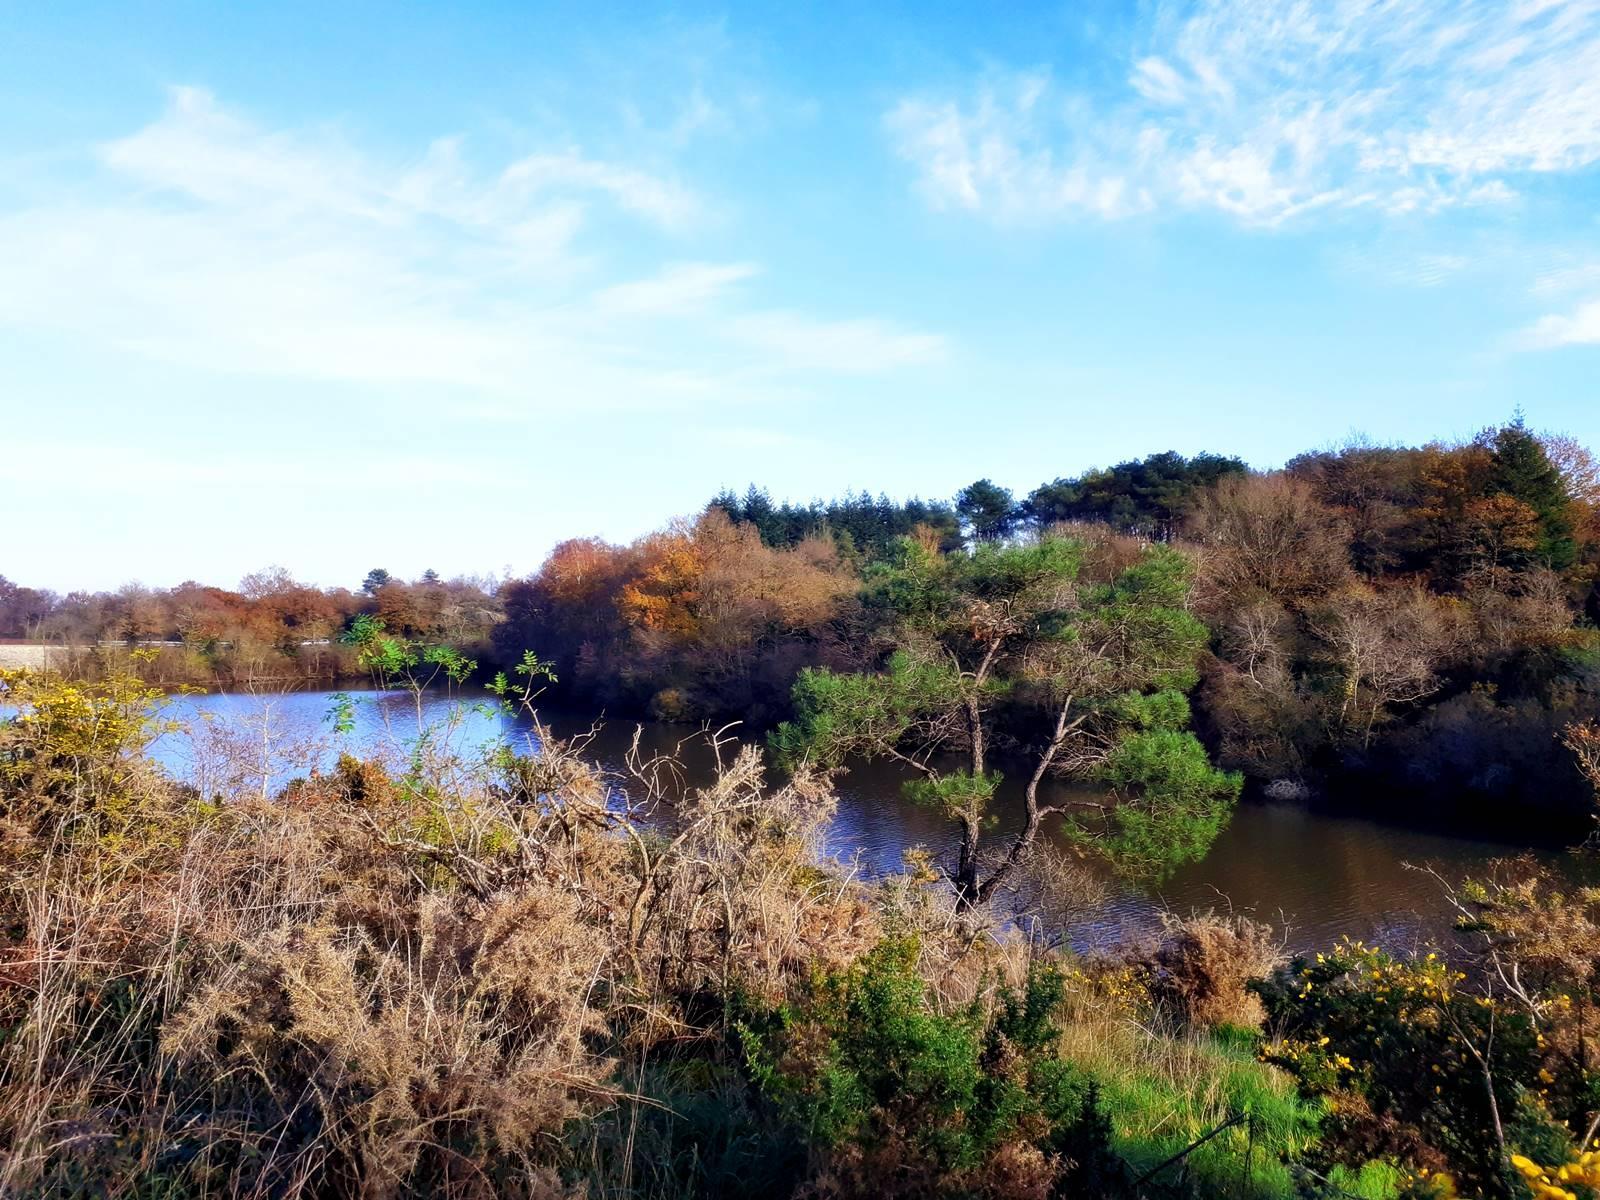 Moisdon la riviere faible20201128 173341